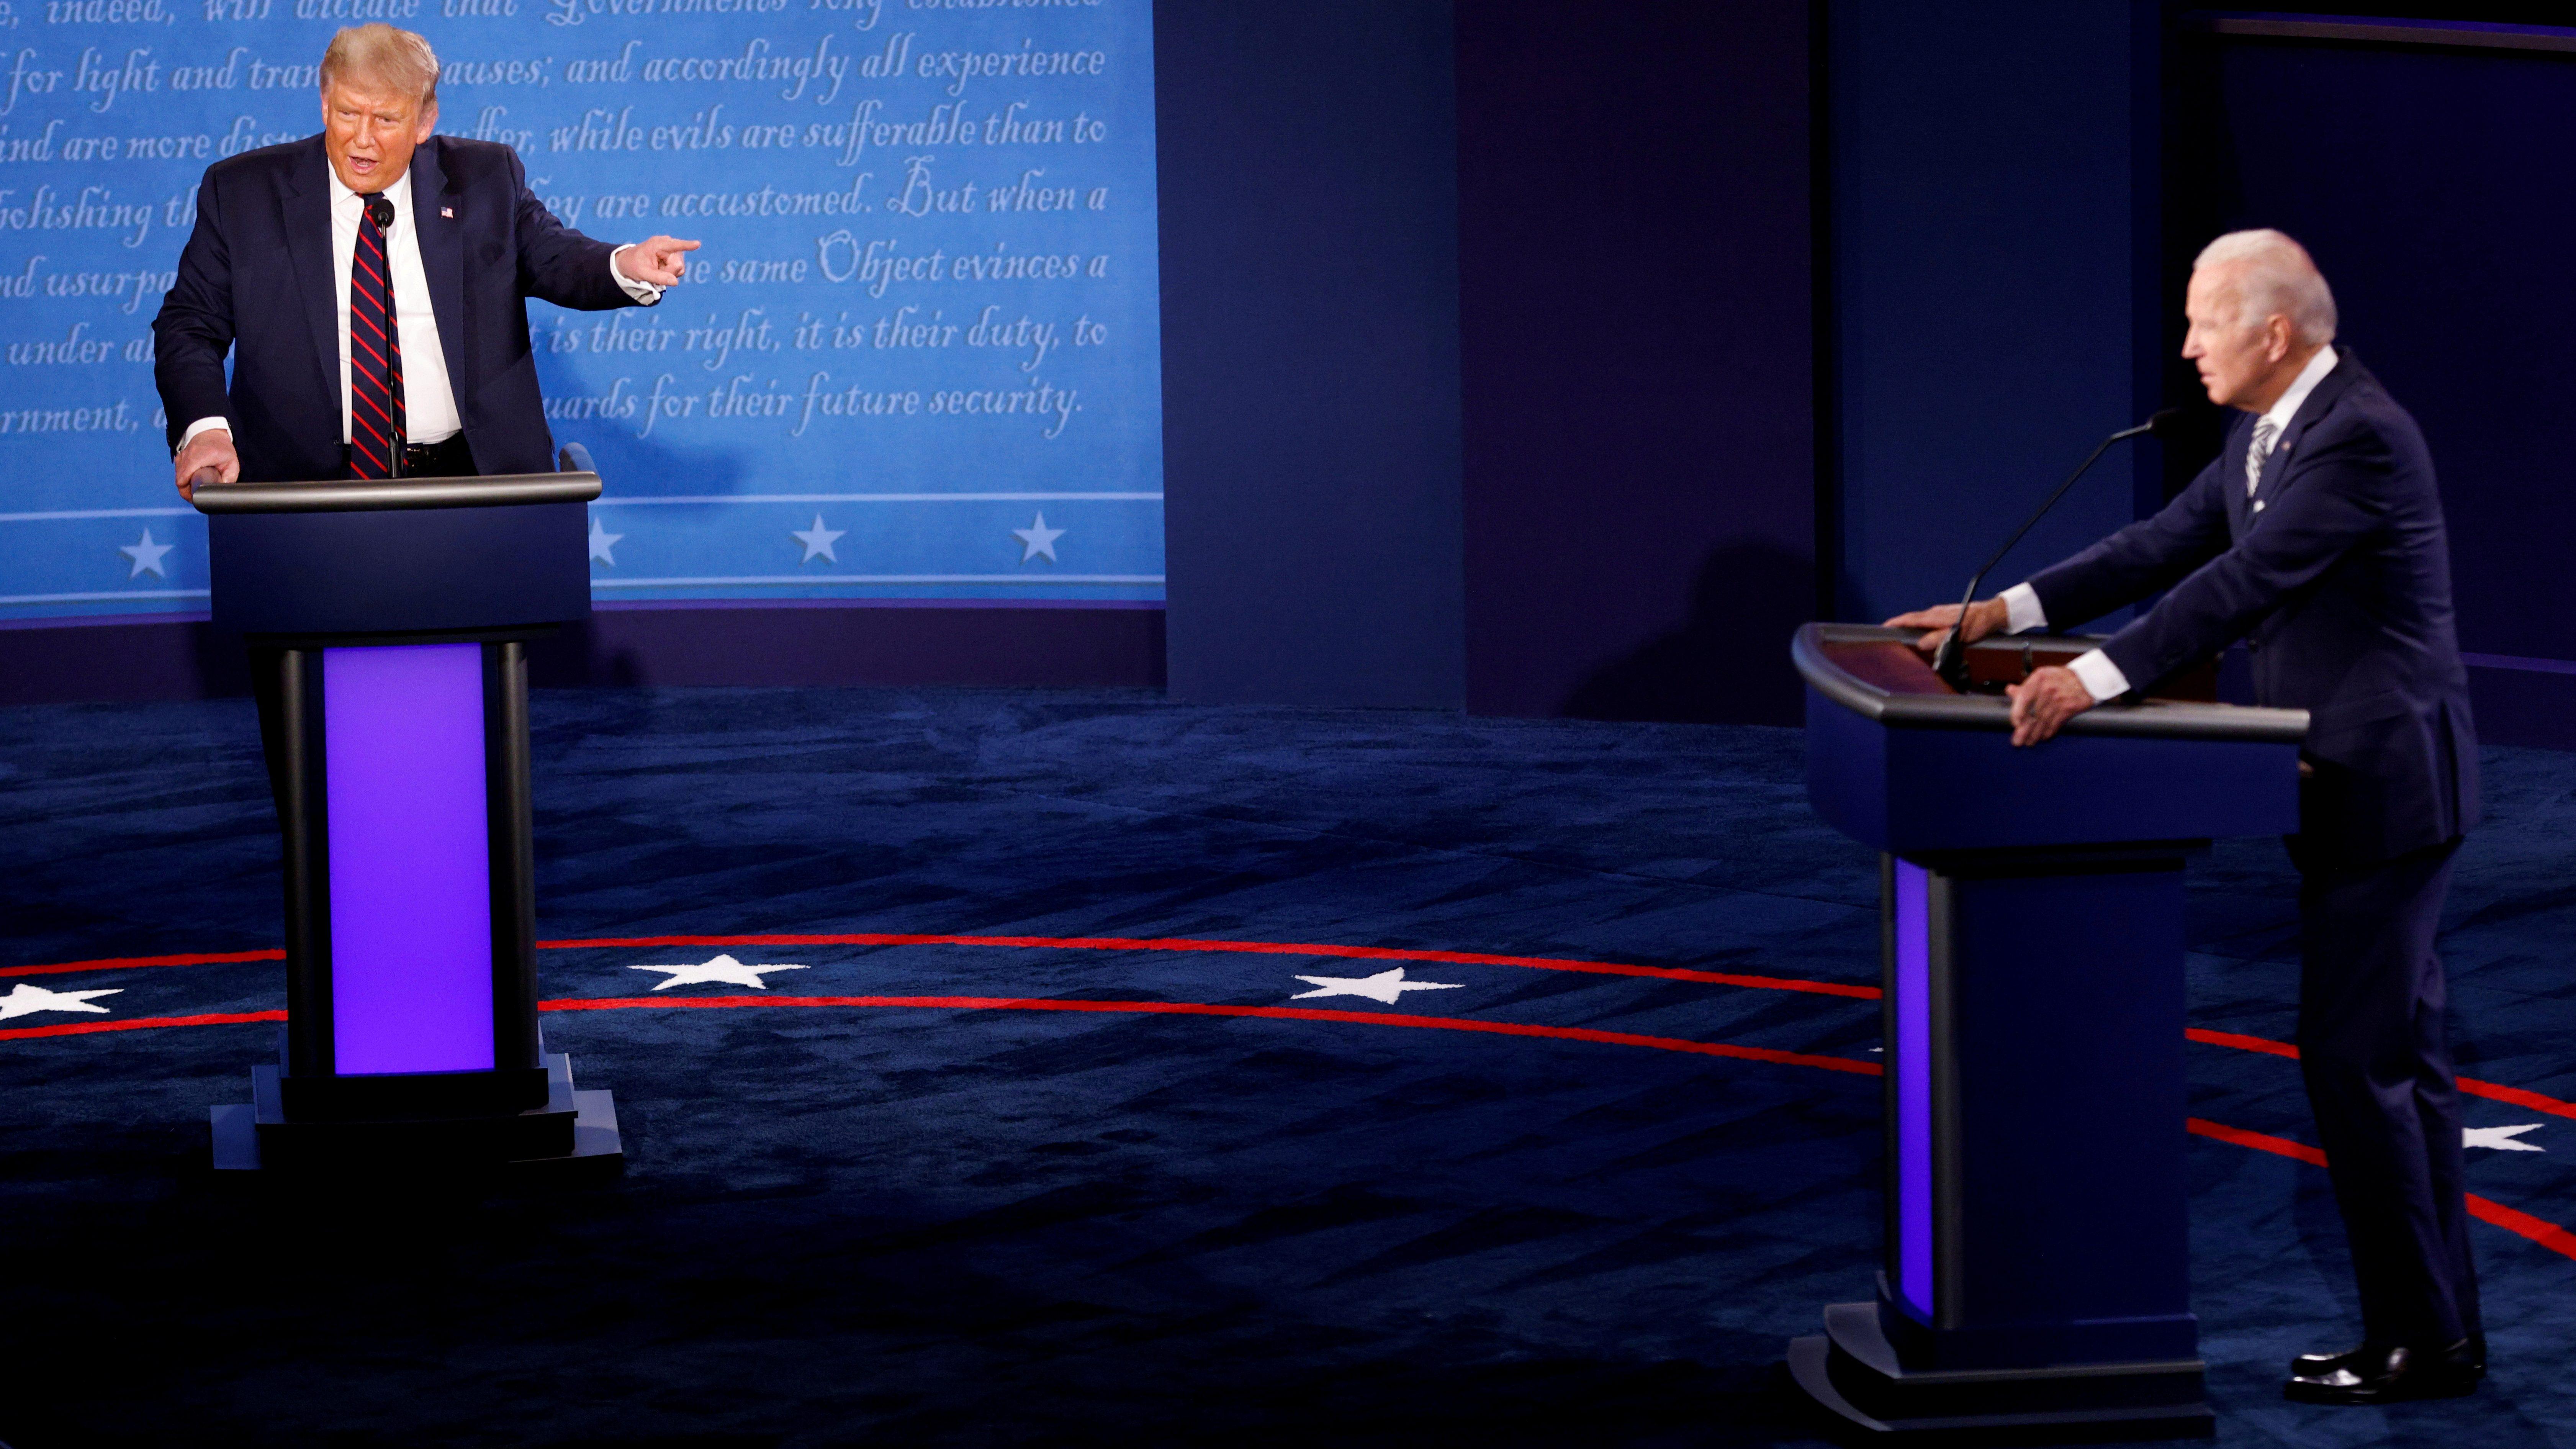 U.S. President Donald Trump and Democratic presidential nominee Joe Biden participate in their first 2020 presidential campaign debate in Cleveland